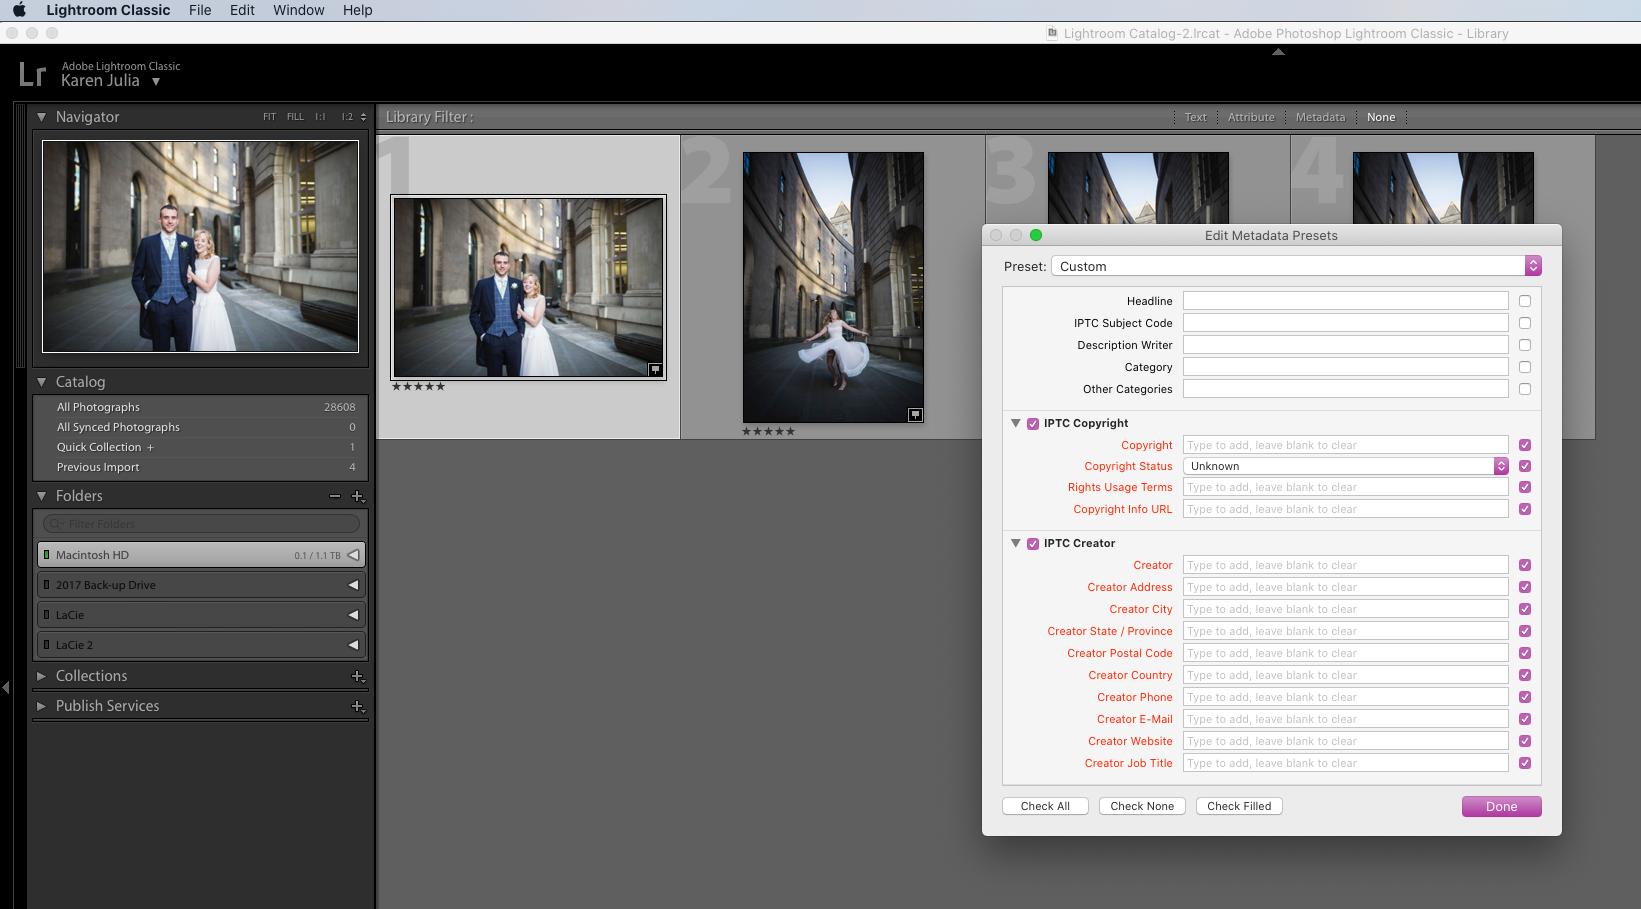 Screenshot of IPTC Image License Metadata boxes in adobe Lightroom